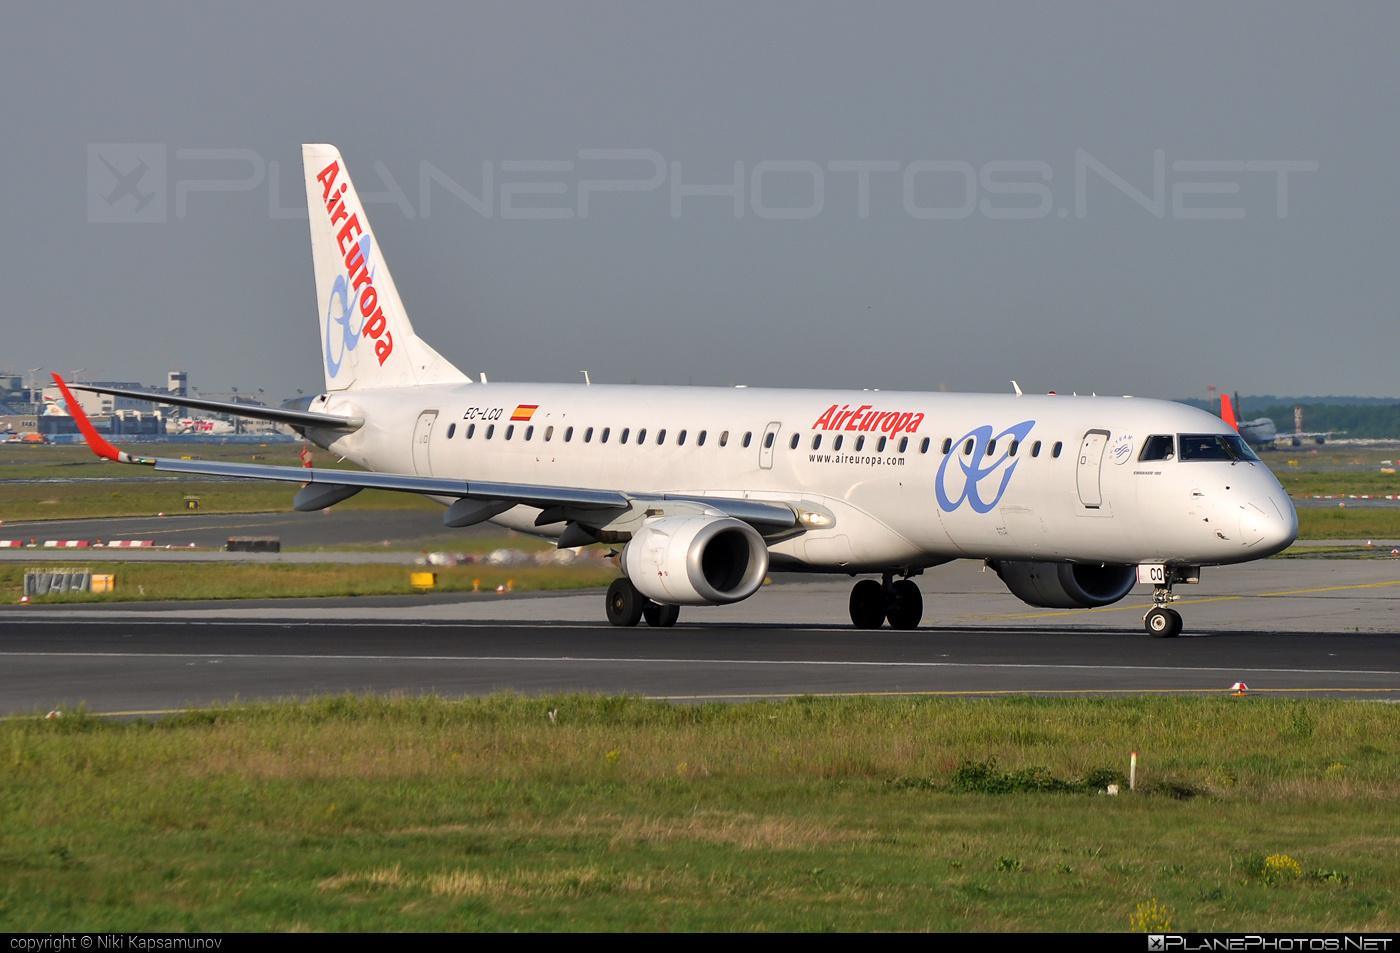 Embraer E195LR (ERJ-190-200LR) - EC-LCQ operated by Air Europa #e190 #e190200 #e190200lr #e195lr #embraer #embraer190200lr #embraer195 #embraer195lr